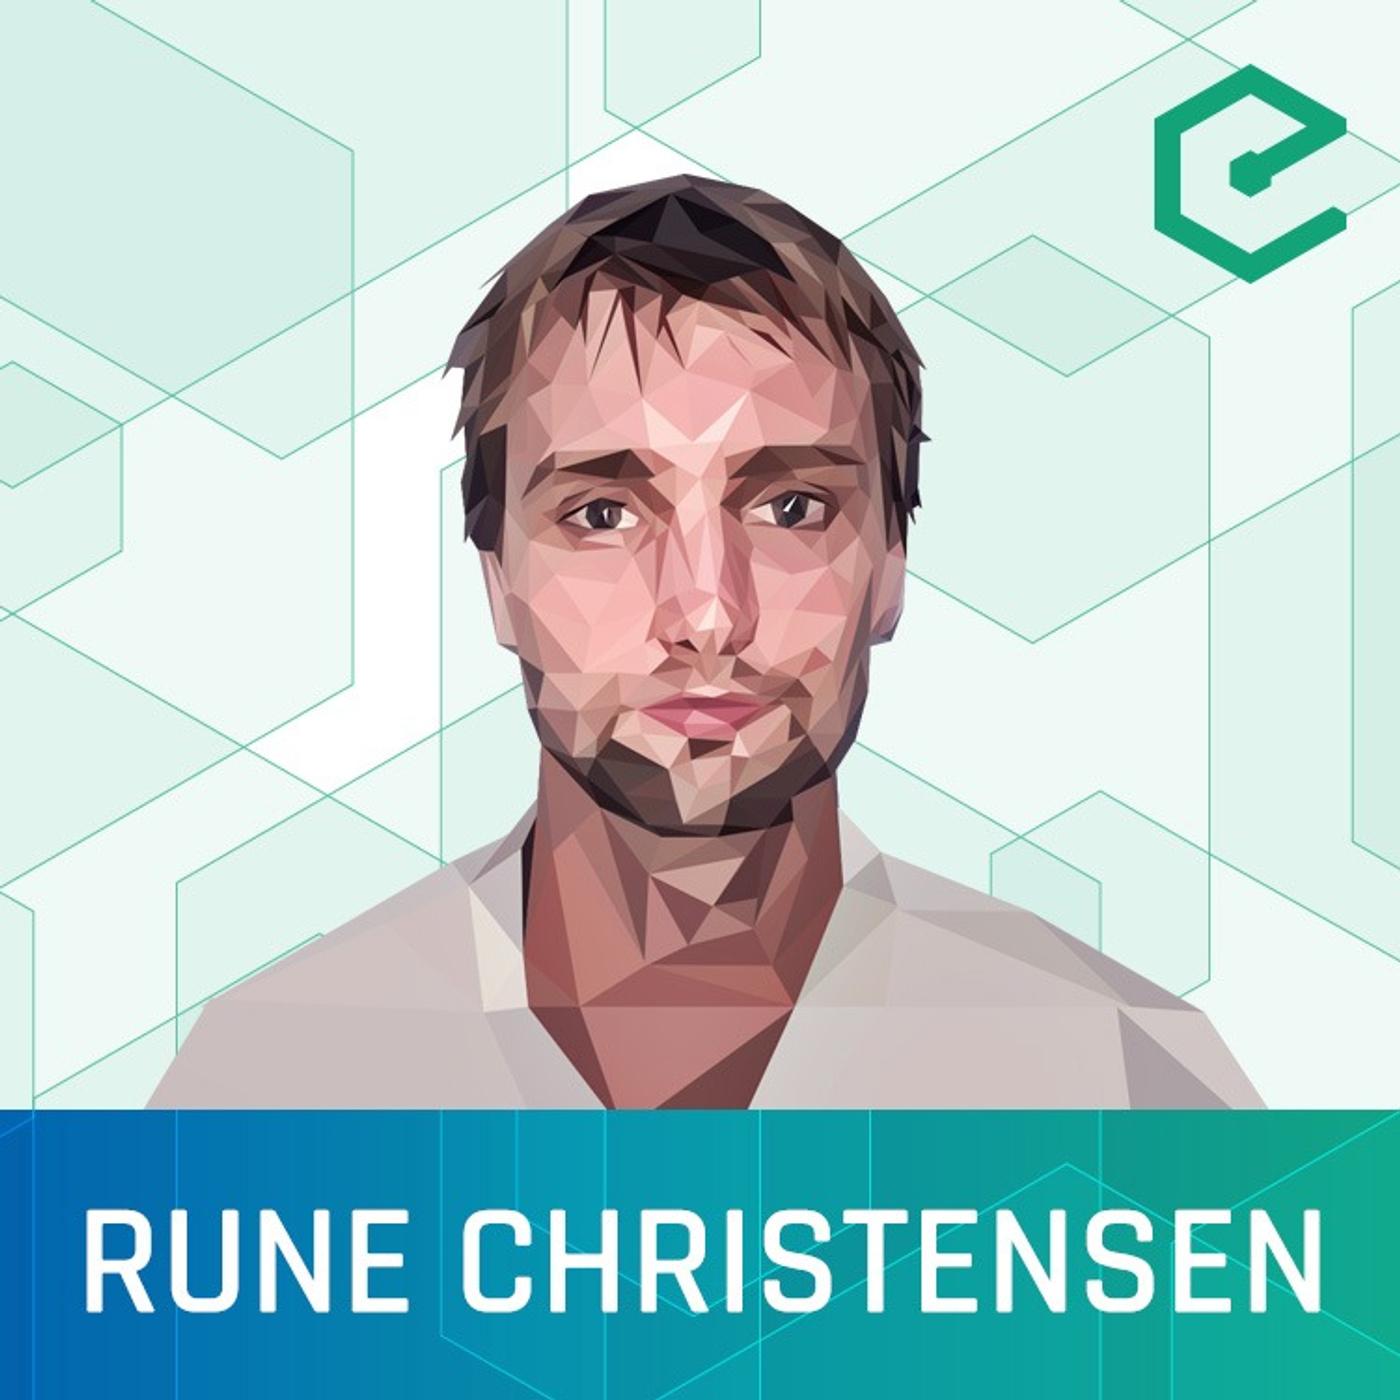 Rune Christensen: Maker DAO – The Central Bank of Web 3.0